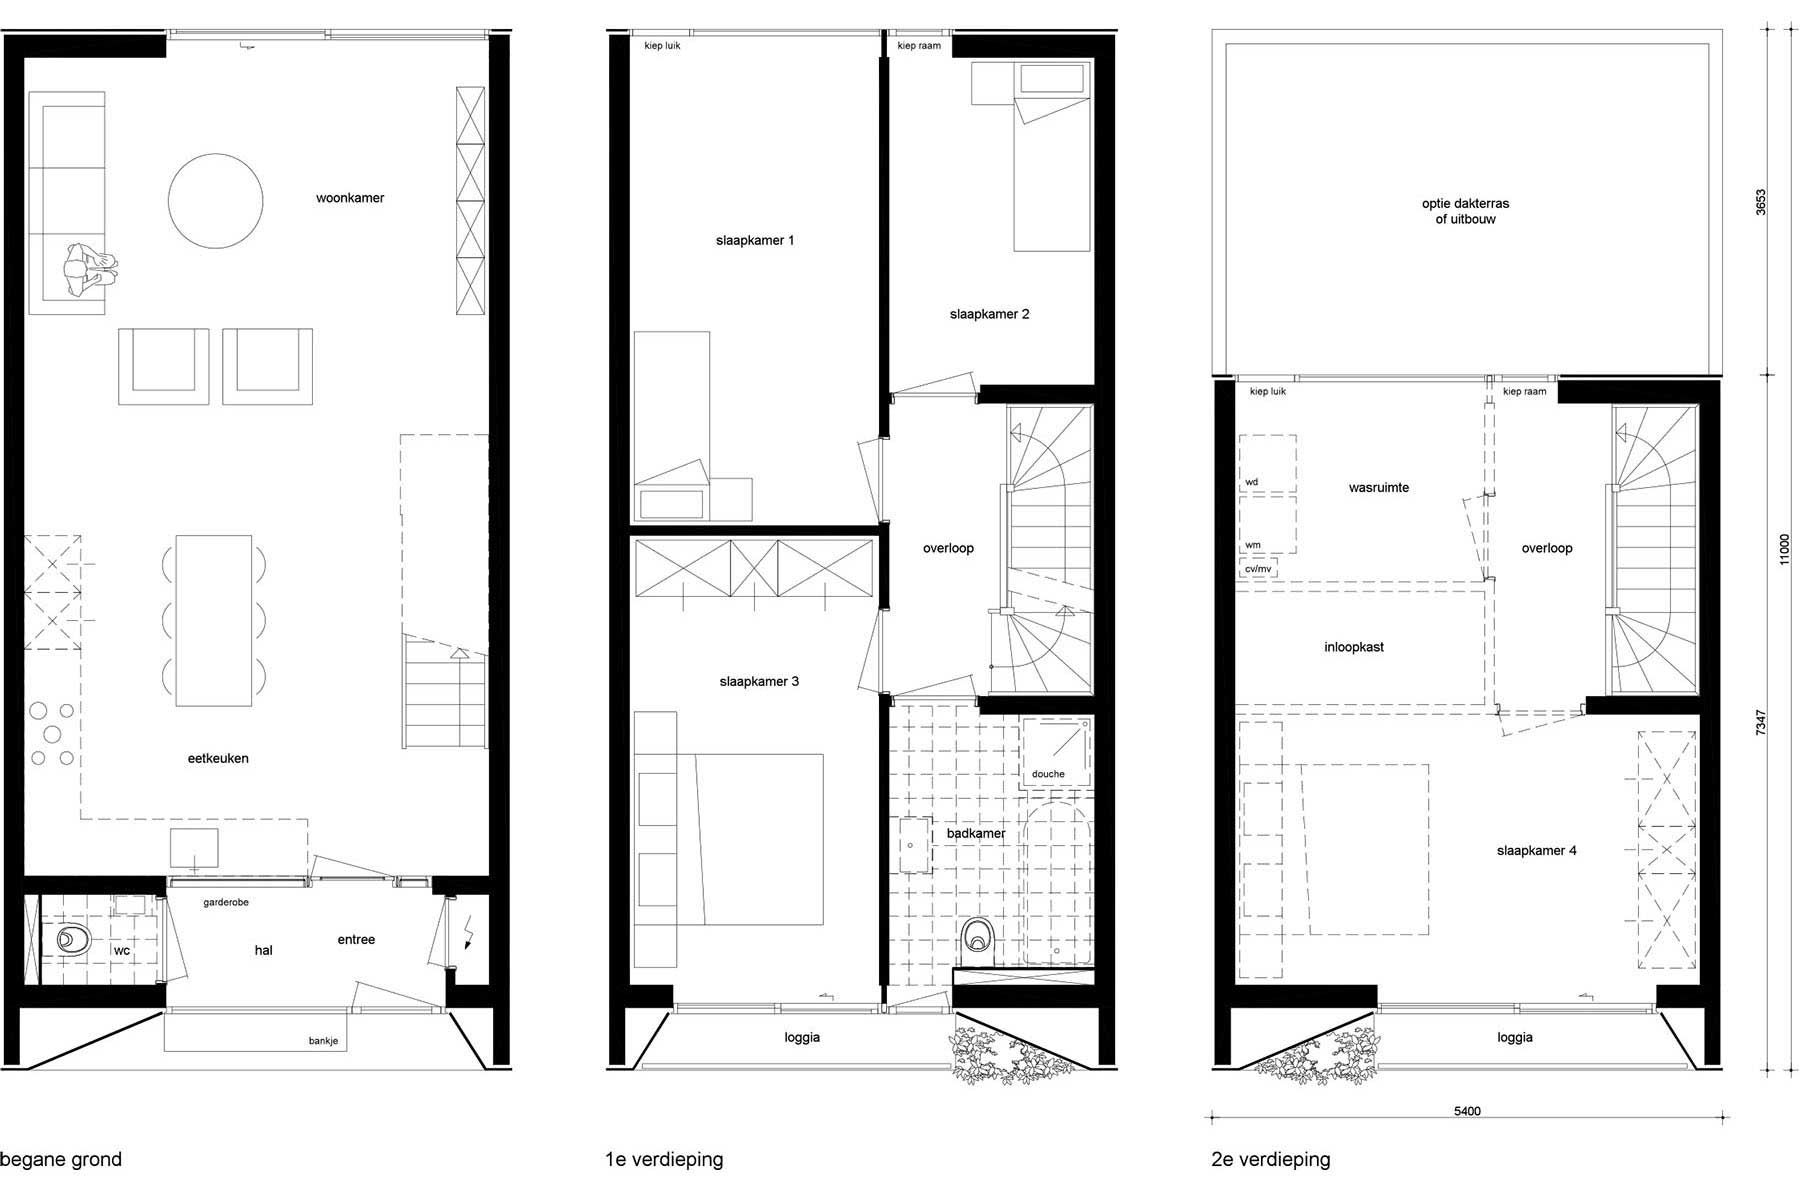 Superb 8A Architecten | Loggia House   Moderne Zelfbouw Rijwoning / Tussenwoning  Met Loggiau0027s / Balkons